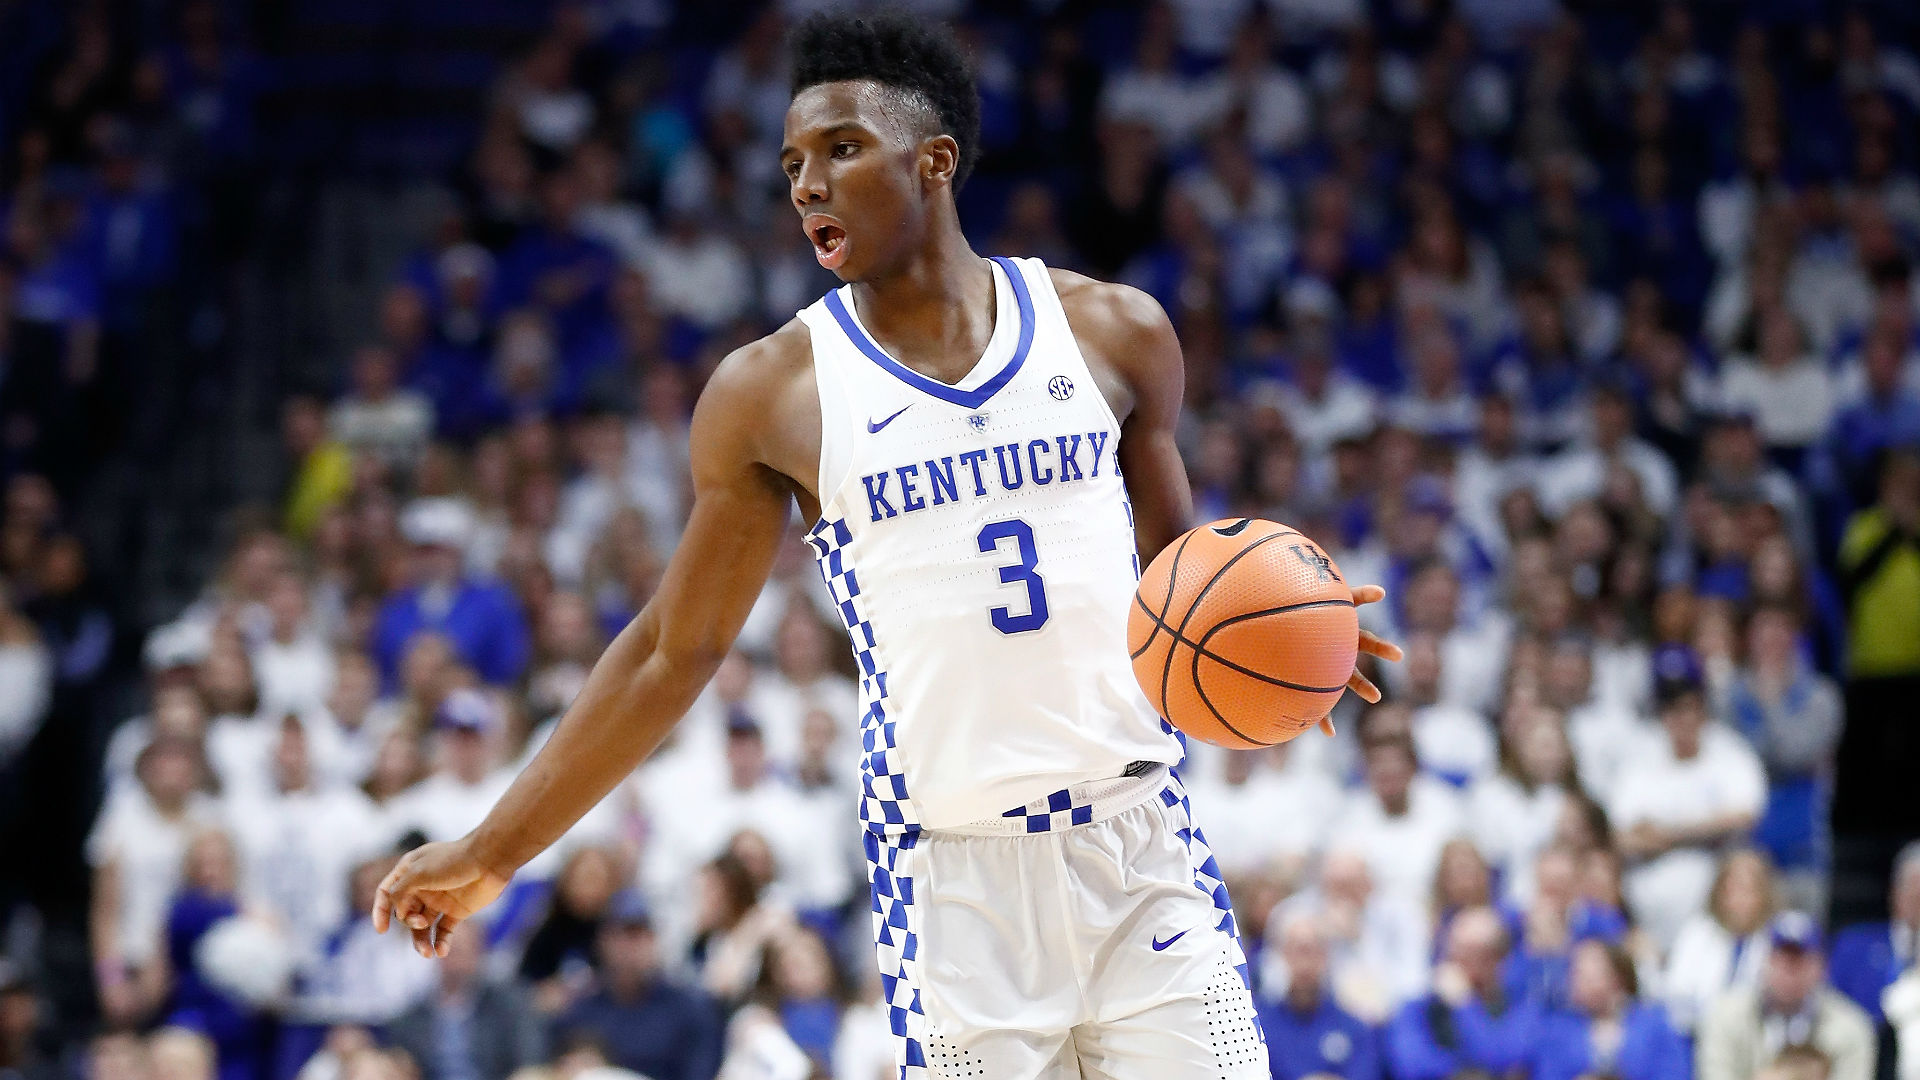 Kentucky Wildcats' Hamidou Diallo goes No. 45